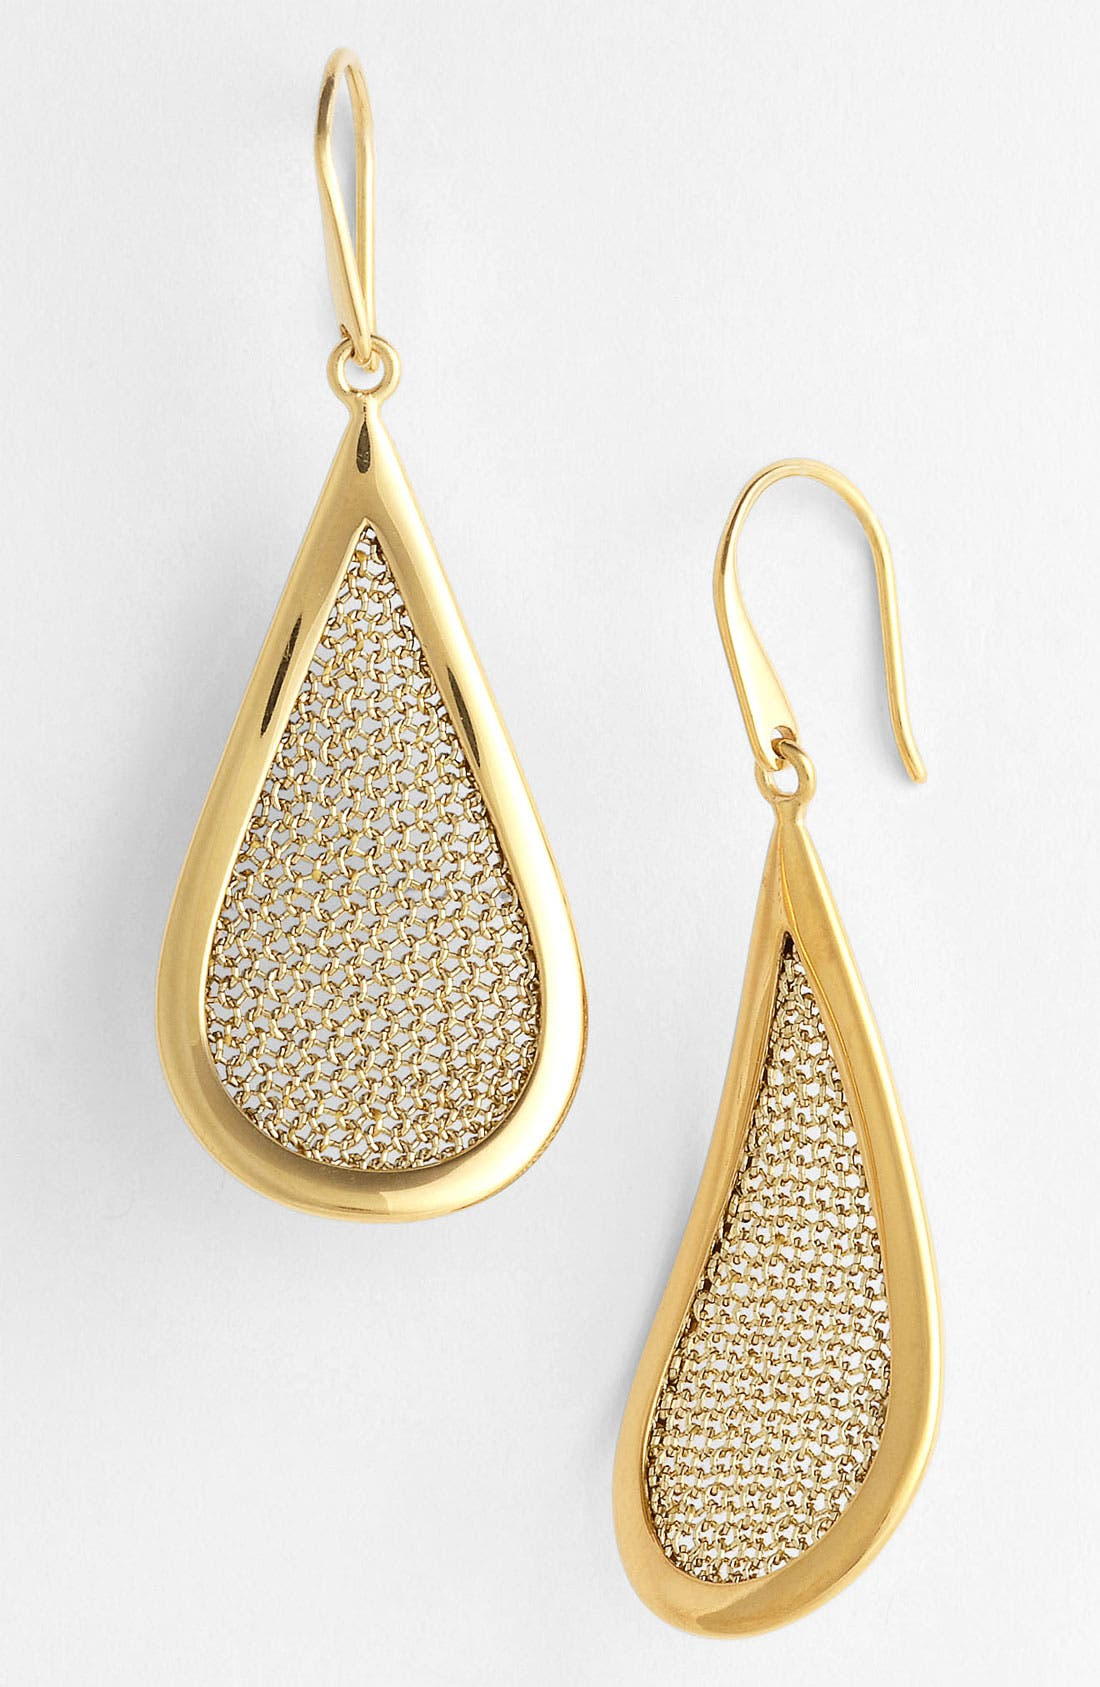 Alternate Image 1 Selected - Adami & Martucci Teardrop Earrings